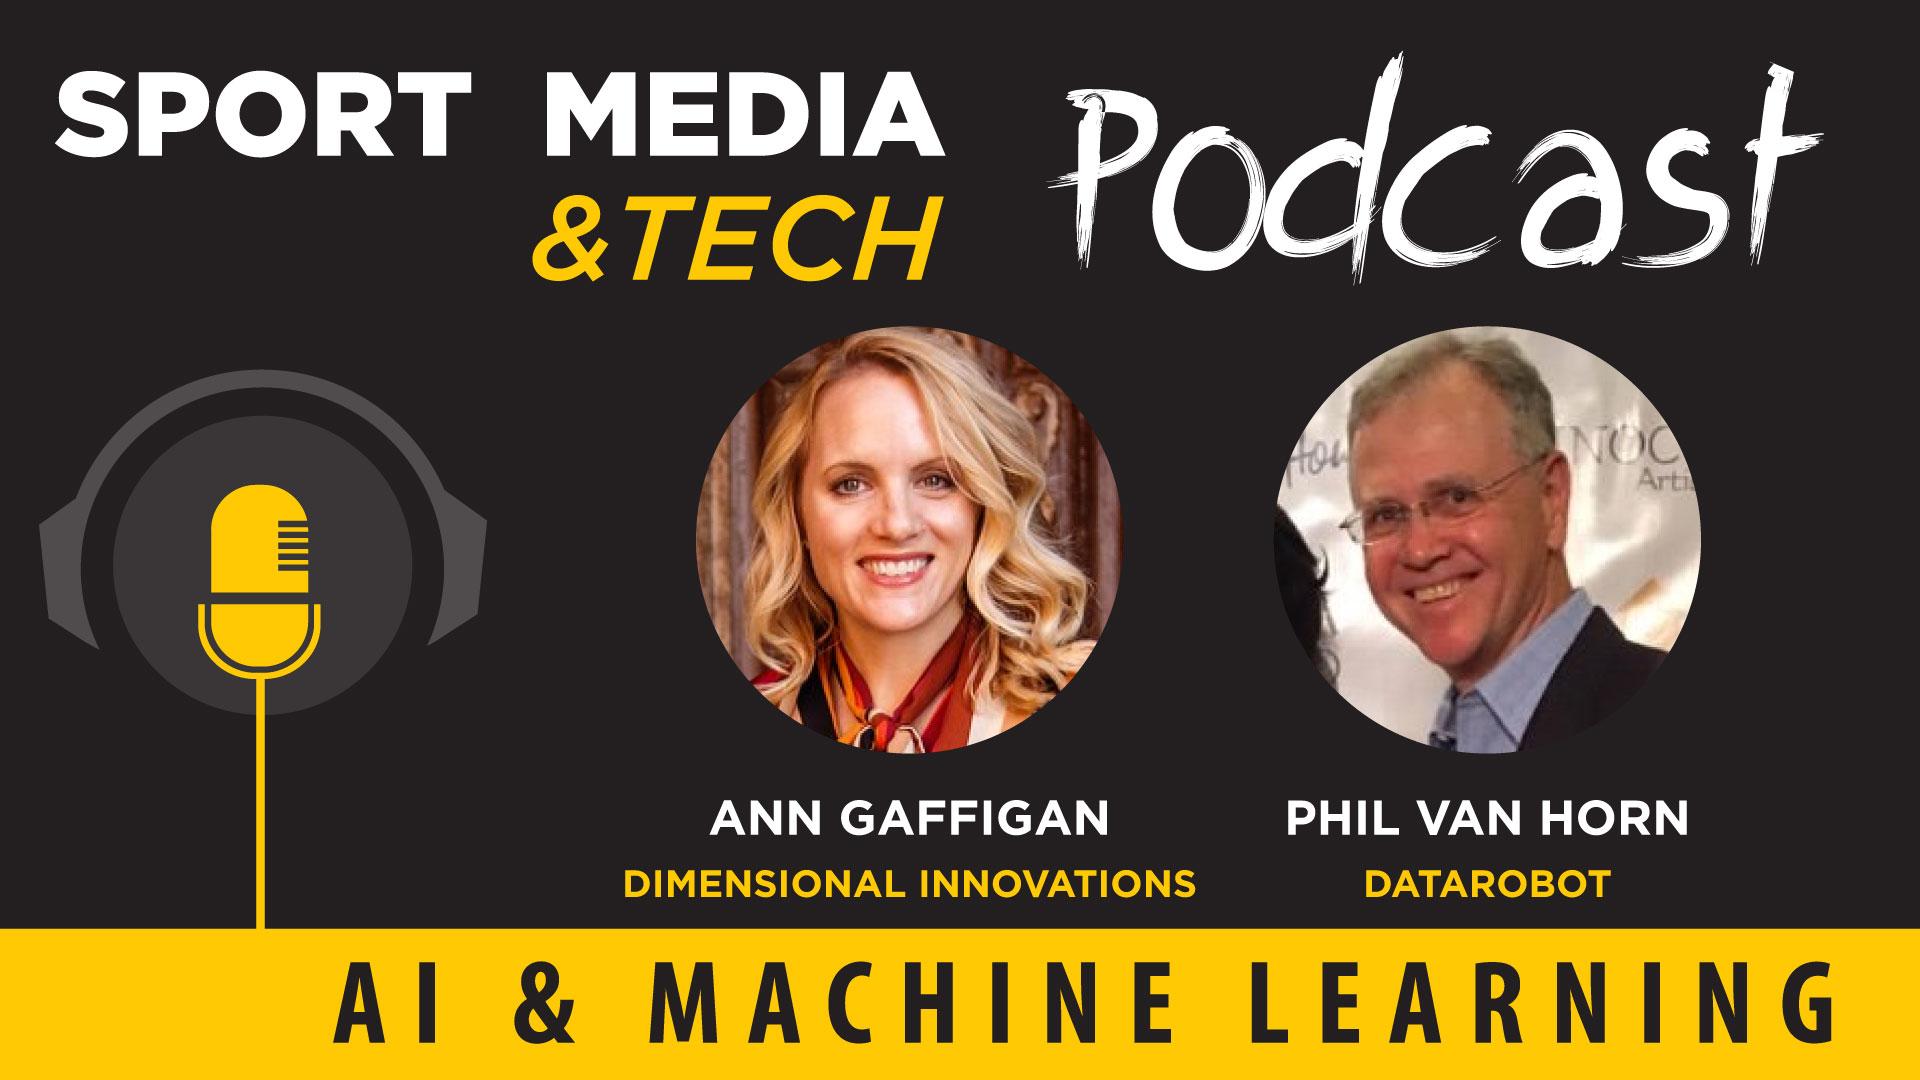 Episode 12: AI & Machine Learning